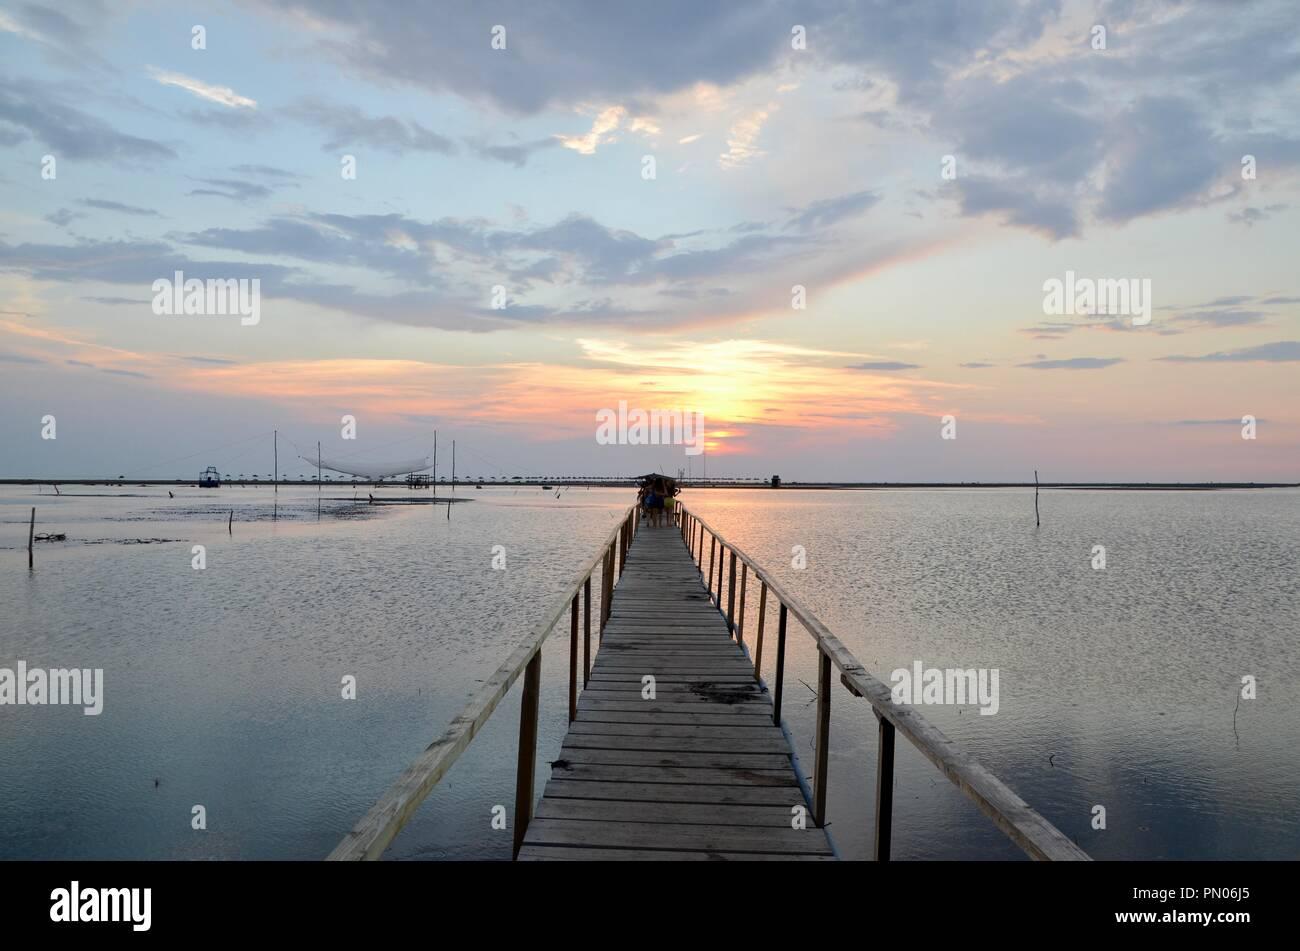 sunsetting over wooden bridge the sea in divjake resort albania - Stock Image